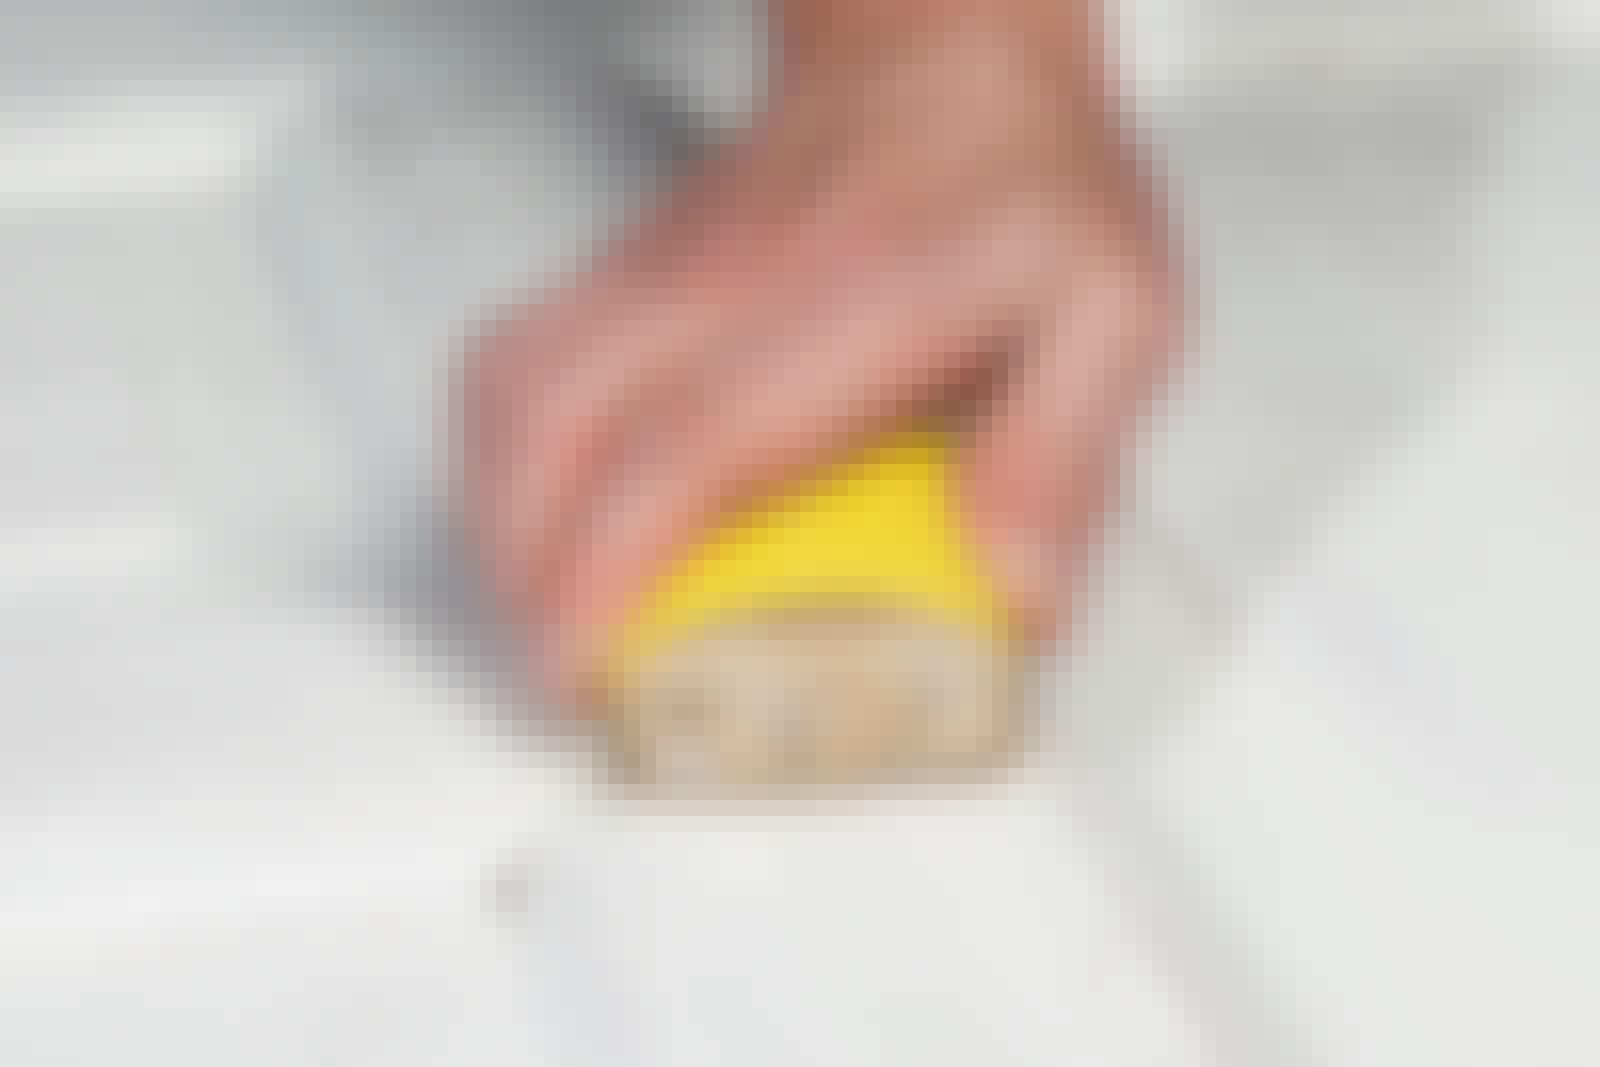 Hiomapaperi: Miten hiomapaperia käytetään?